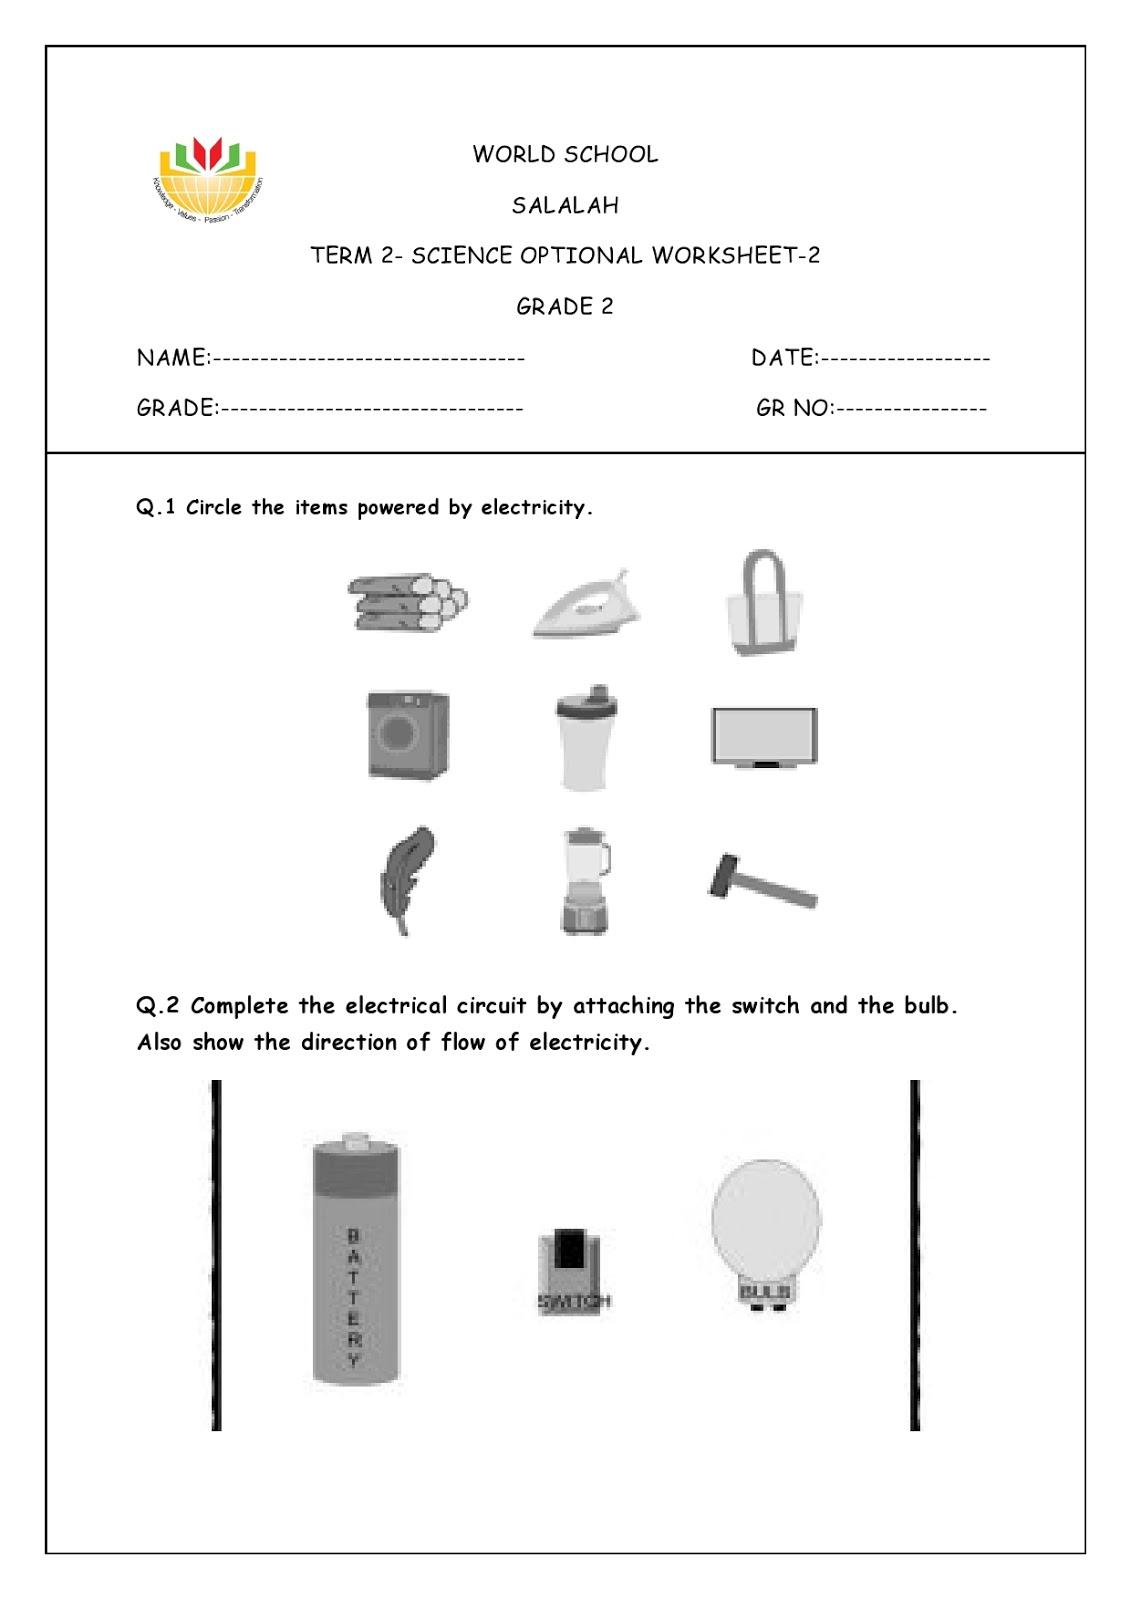 WORLD SCHOOL OMAN: Homework for Grade 2 as on 17/03/2020 [ 1600 x 1131 Pixel ]